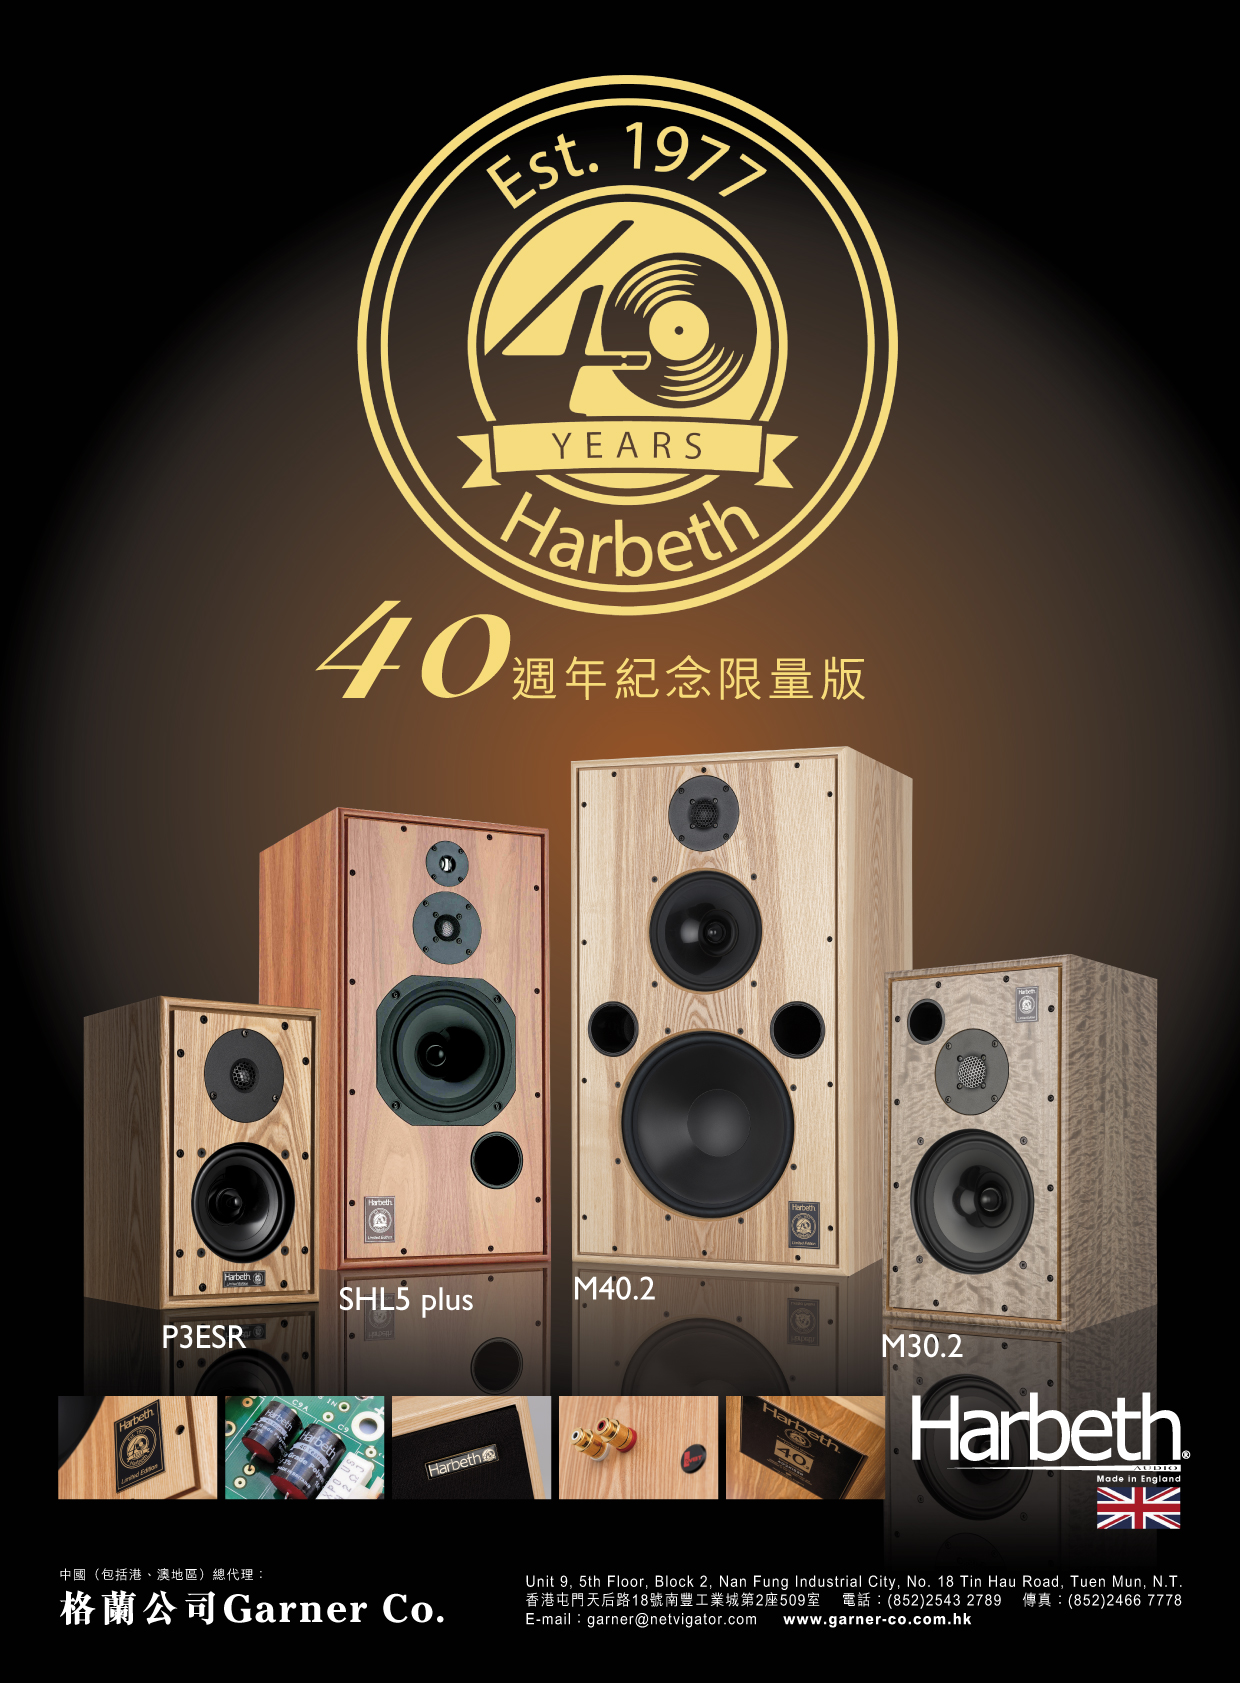 Harbeth-40th-2